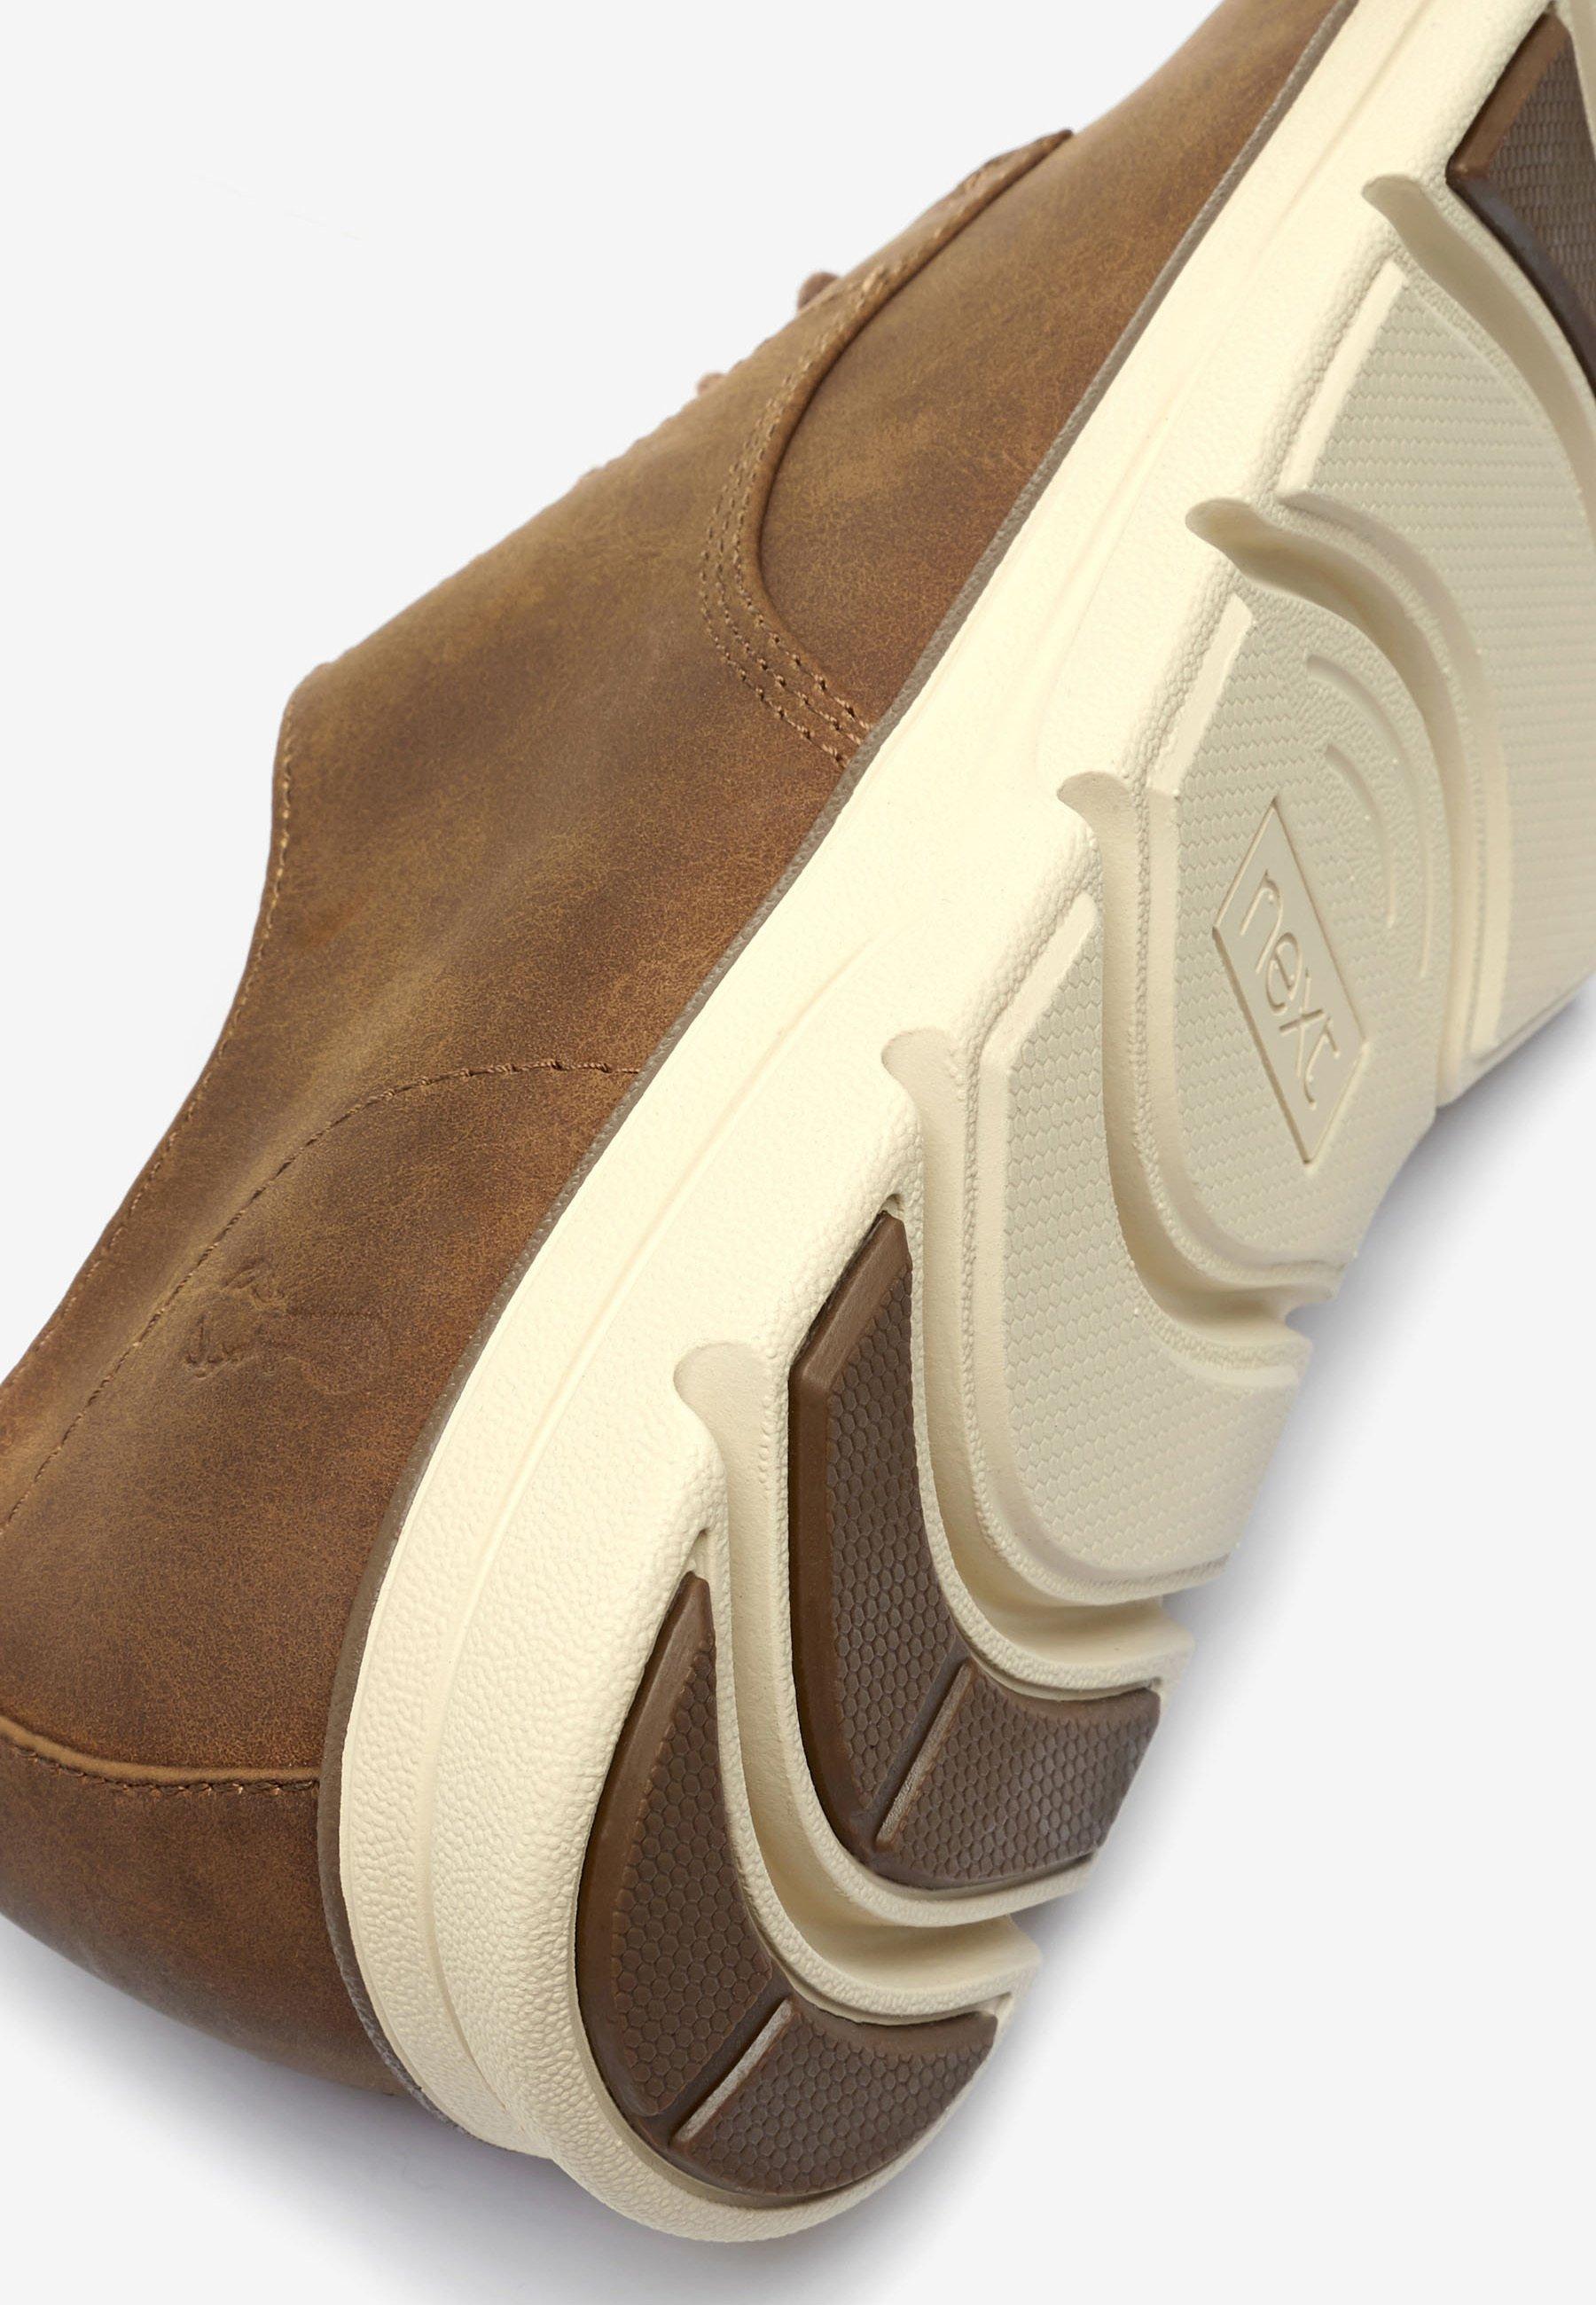 Next Sportiga snörskor - brown/brun - Herrskor DO6Ls